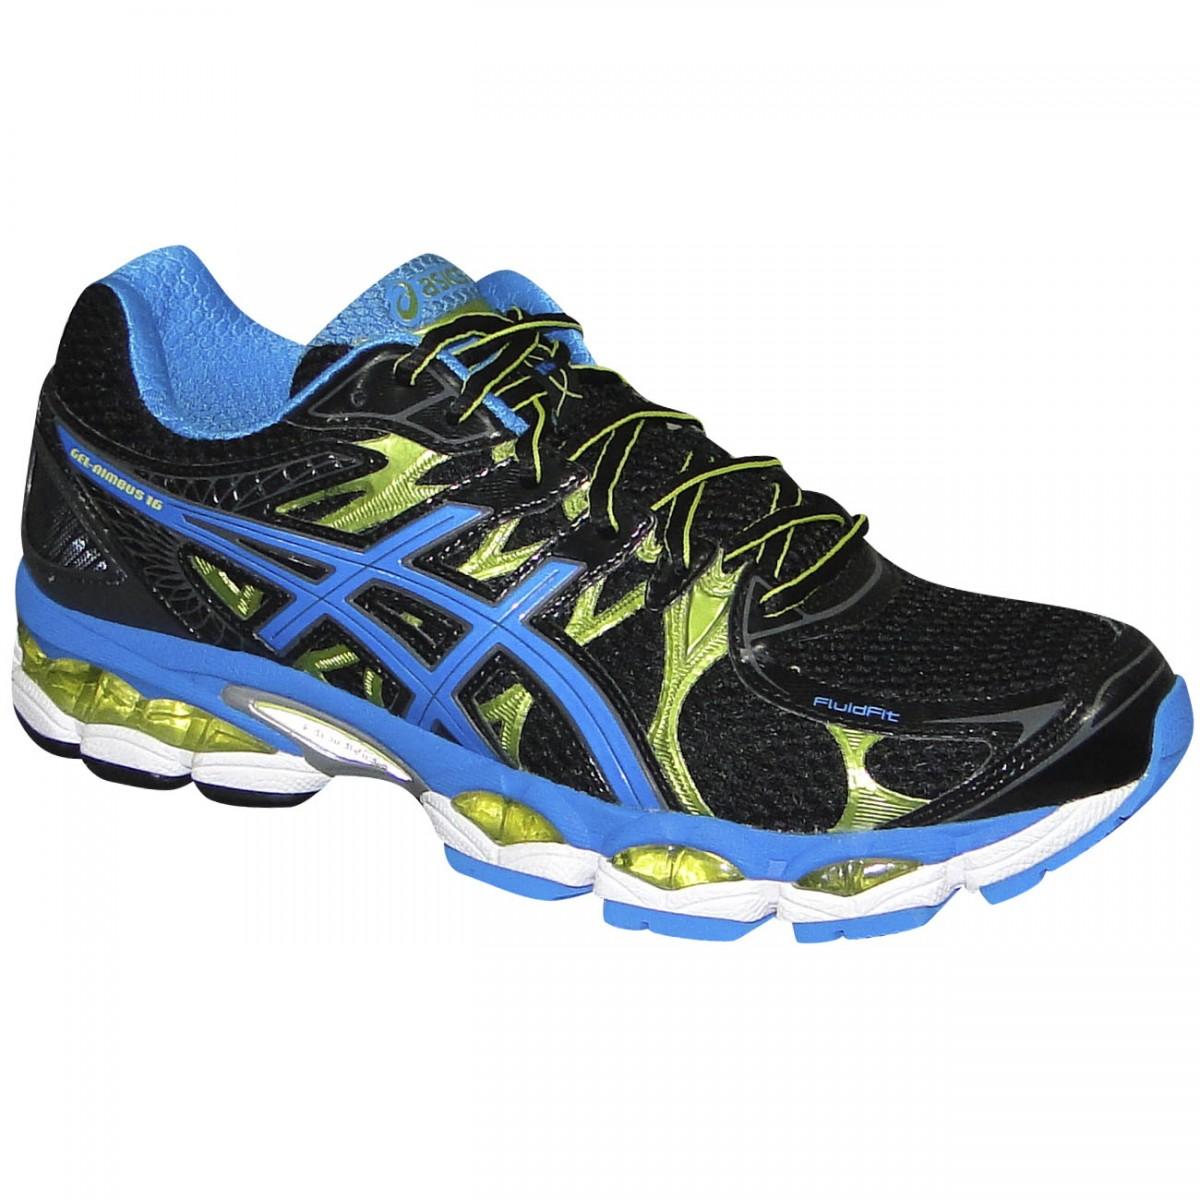 ... 44f567e014a Tenis Asics Gel-Nimbus 16 T435N 9842 - Preto Azul Limão -  Chuteira Nike ... 4212e8d6c7ba5